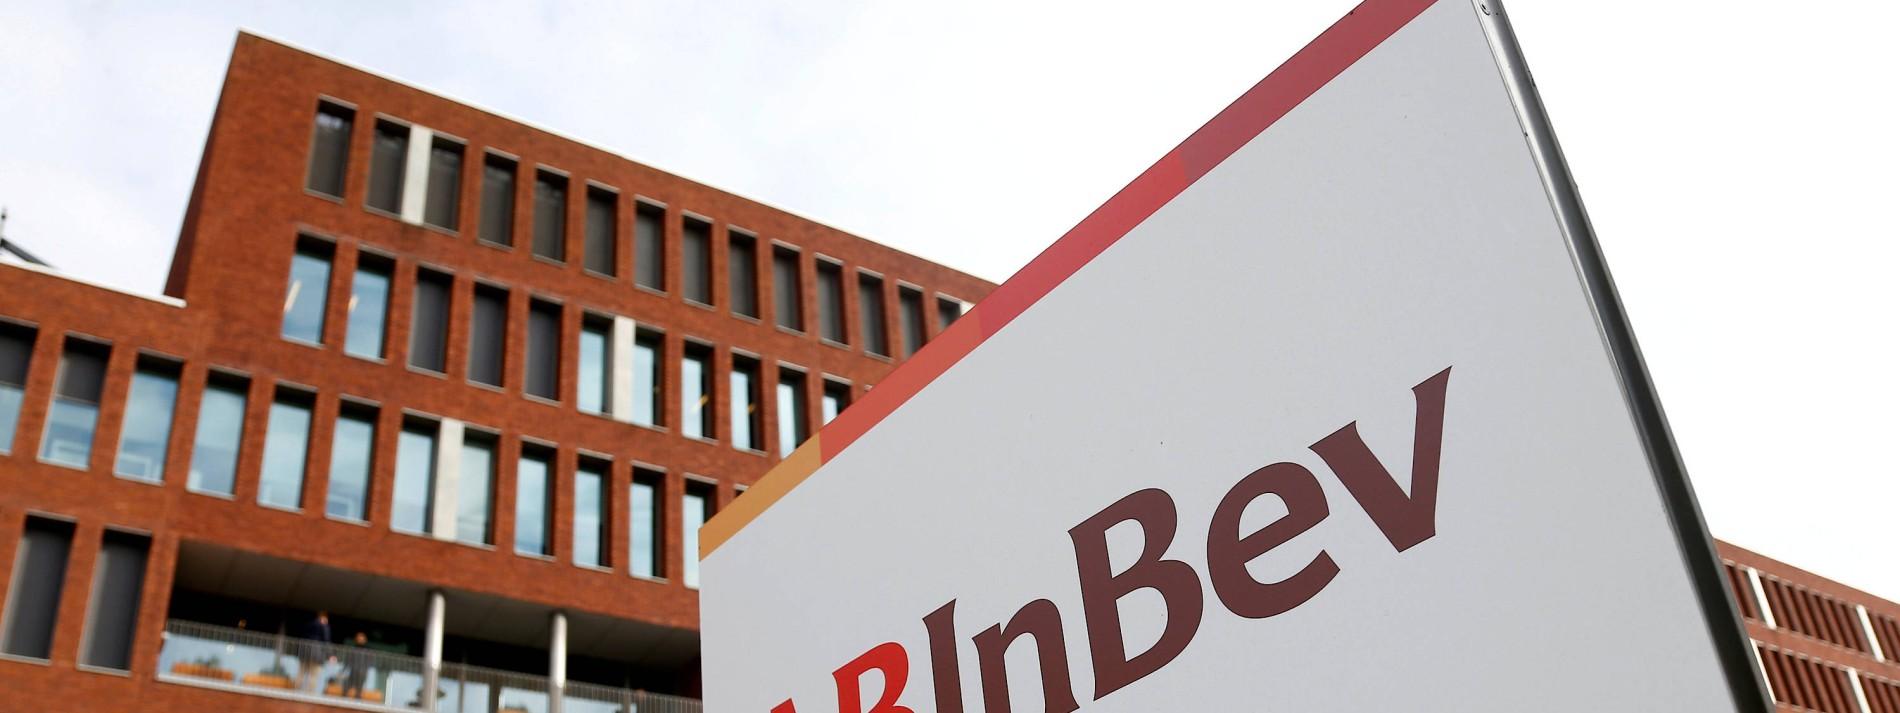 An der Brüsseler Börse wächst die Zuversicht